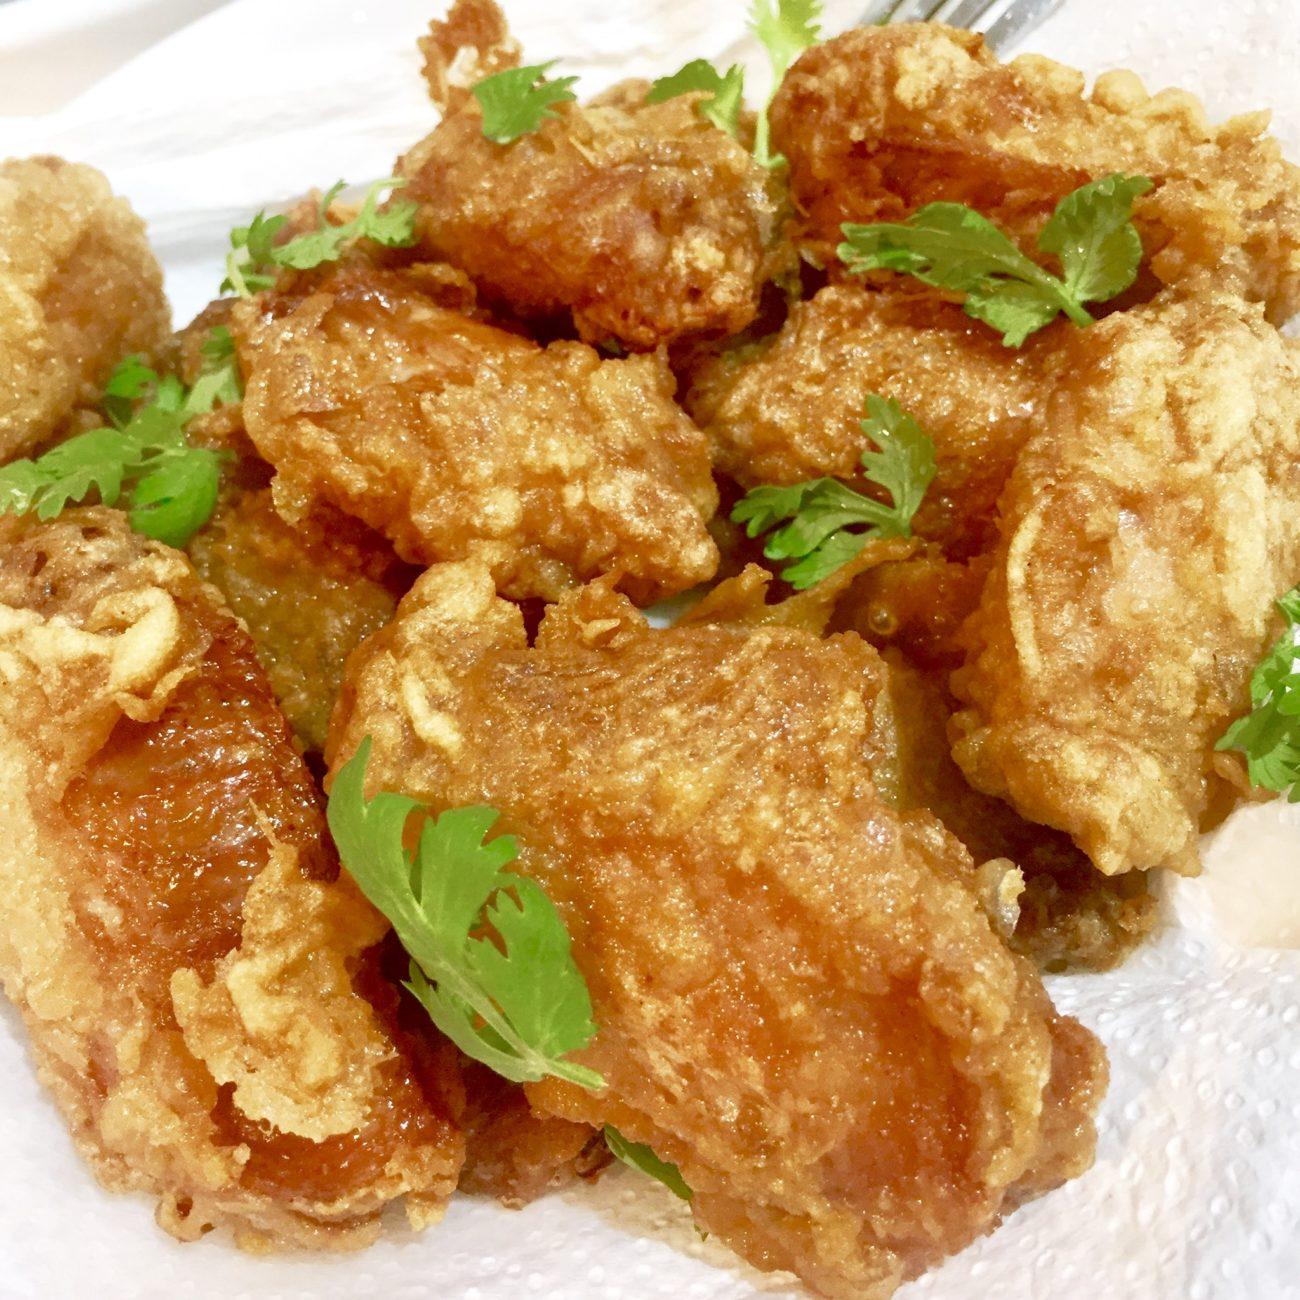 Simple Prawn Paste Chicken Recipe (Har Cheong Gai)